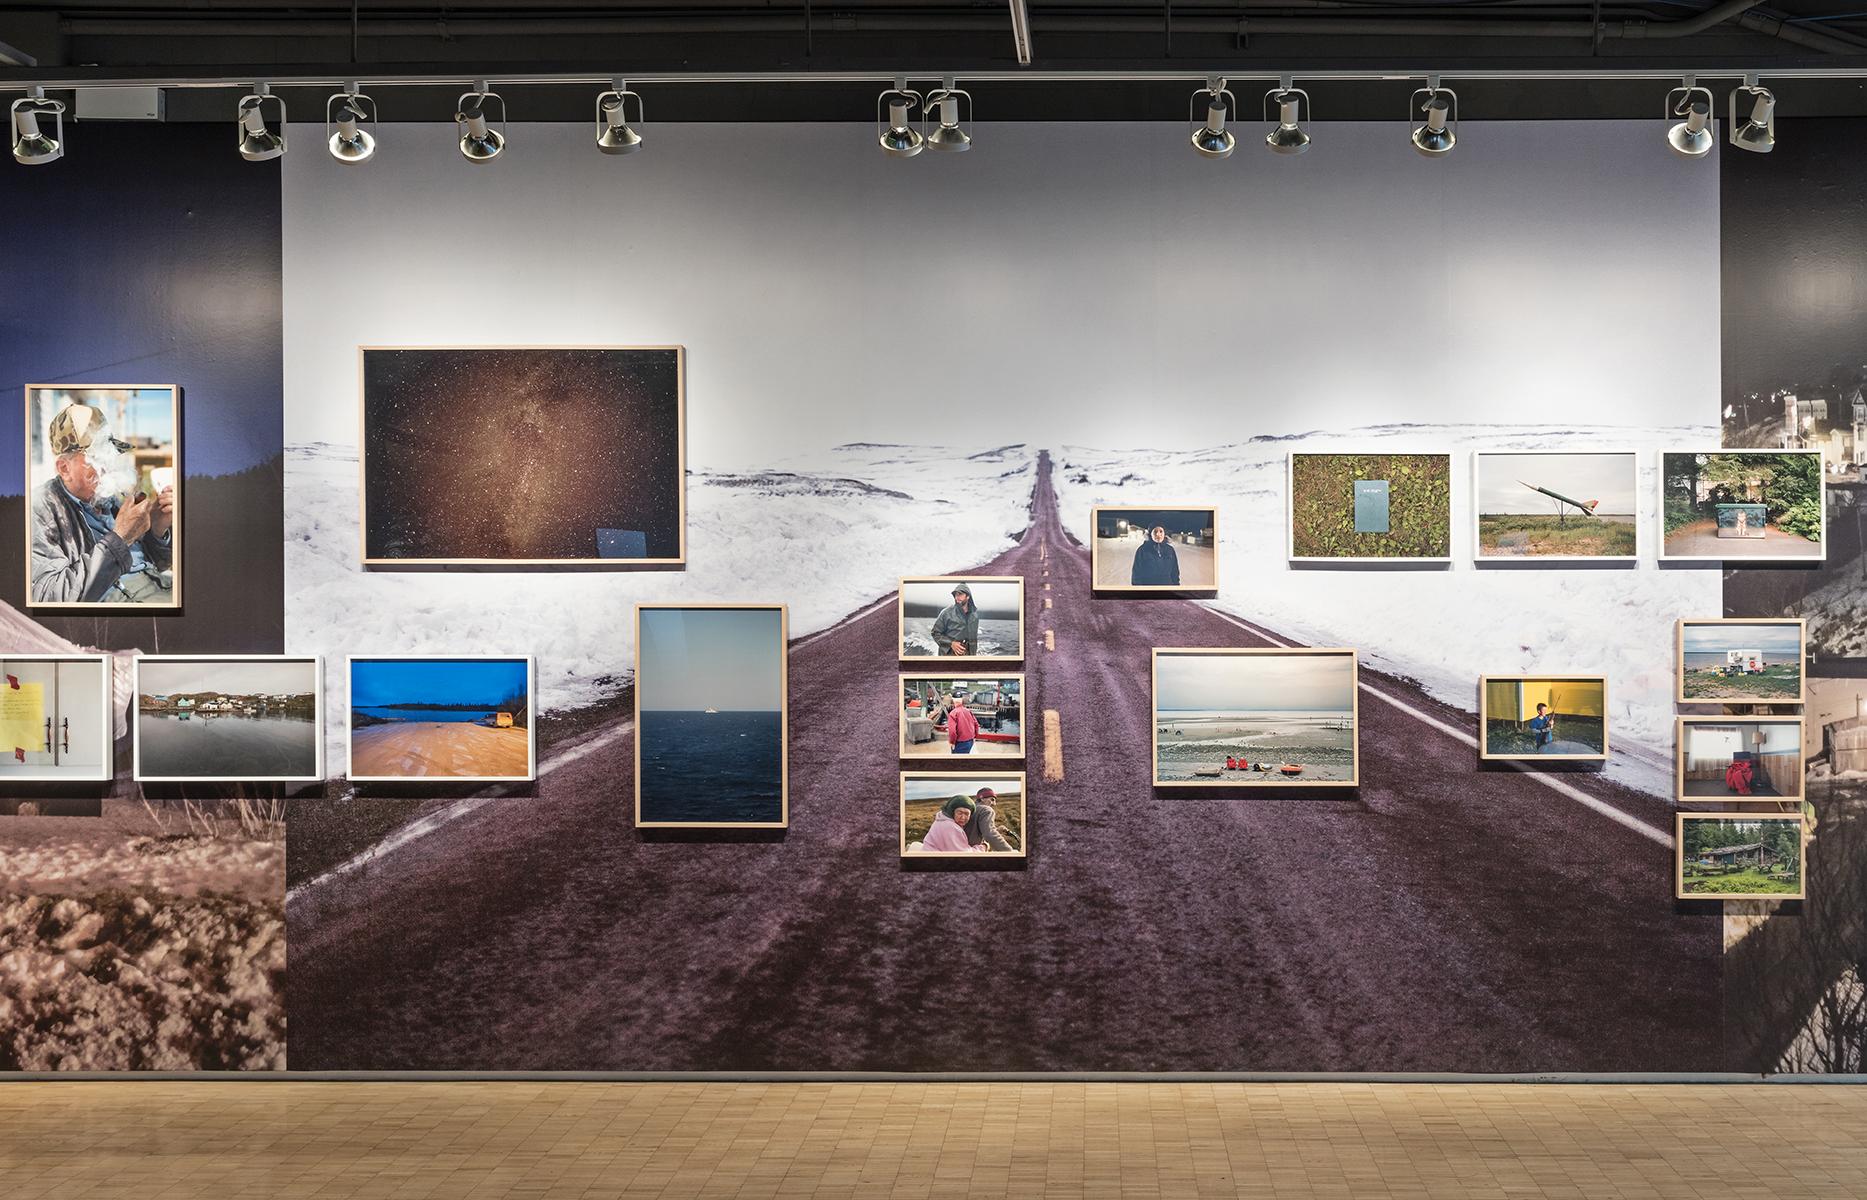 Installation view of Johan Hallberg-Campbell, Coastal, photo by Toni Hafkenscheid.